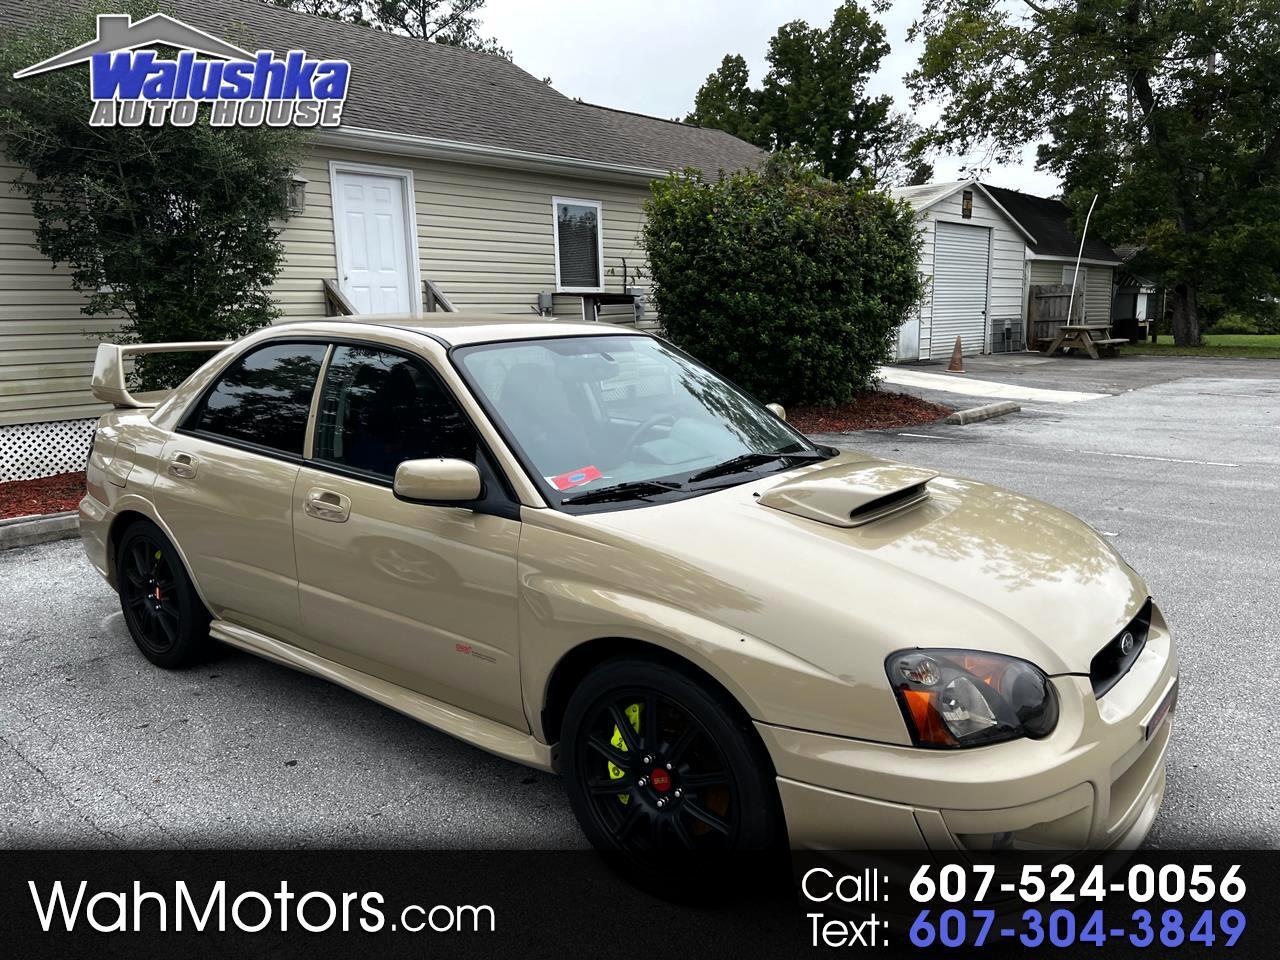 Subaru Impreza Sedan (Natl) 2.5 WRX STi w/Gold Wheels 2005